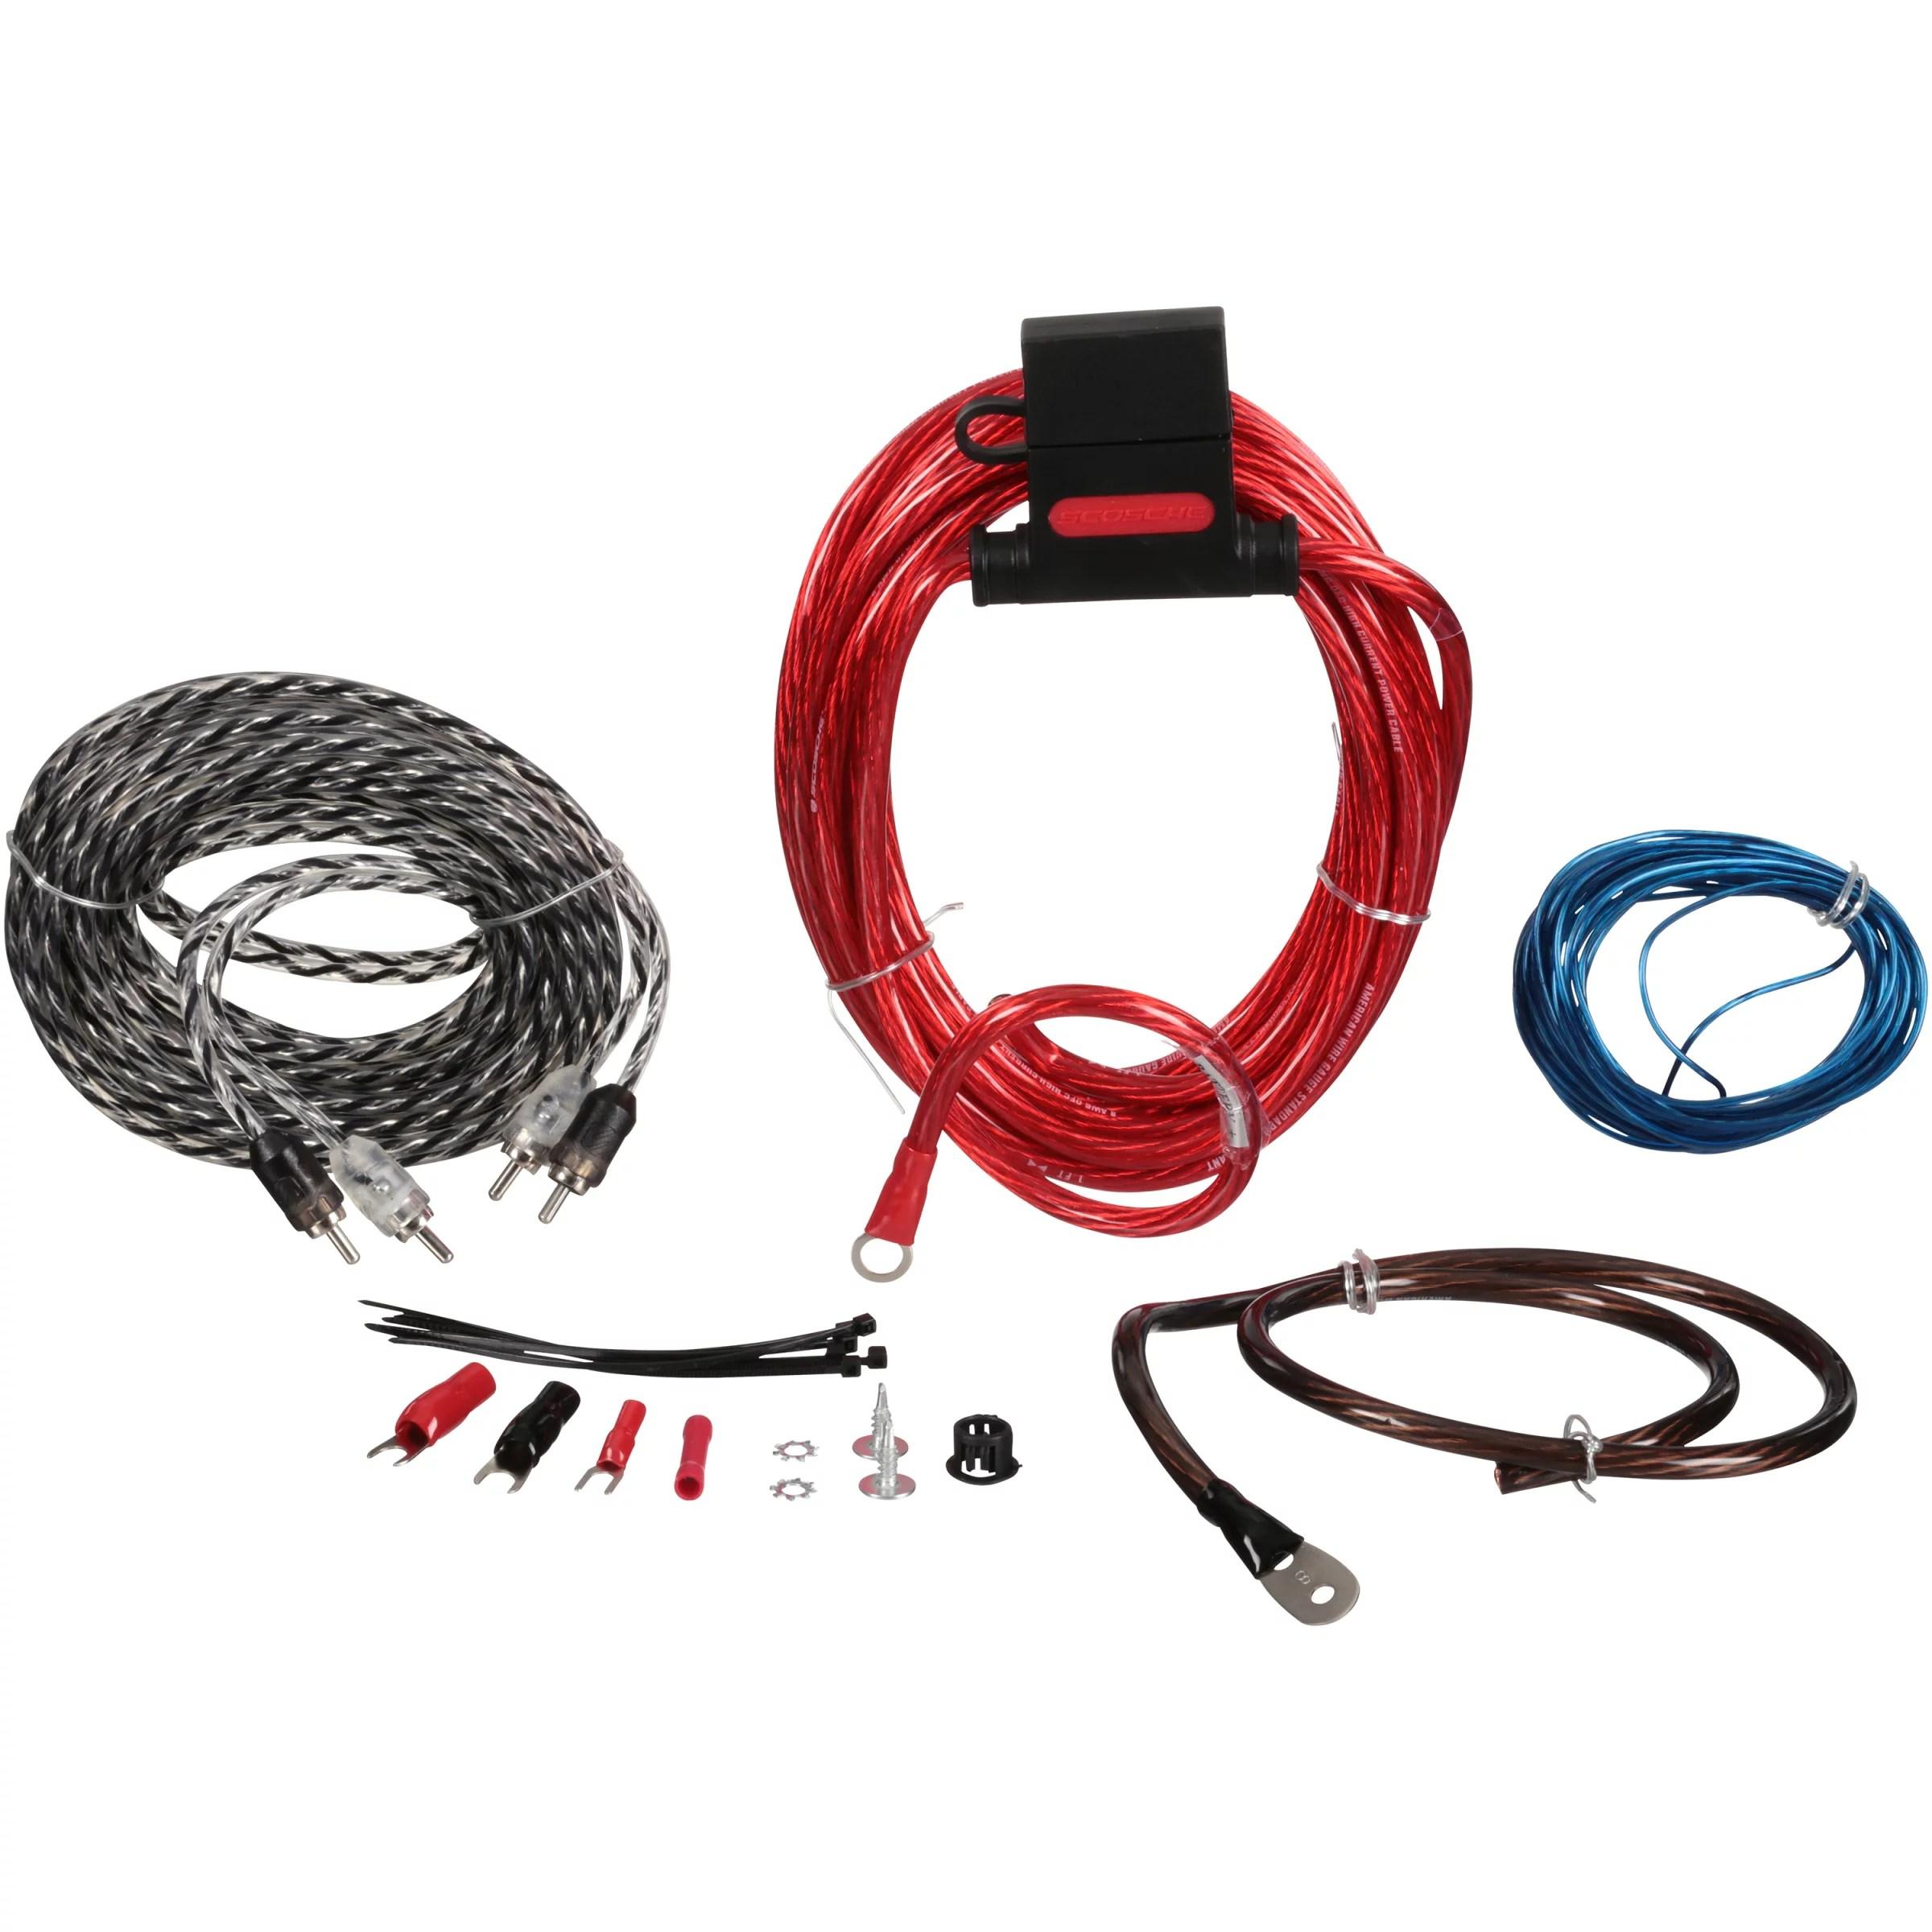 small resolution of scosche car stereo amplifier wiring kit wiring diagram todayscosche 680 watt max 400 amp wiring